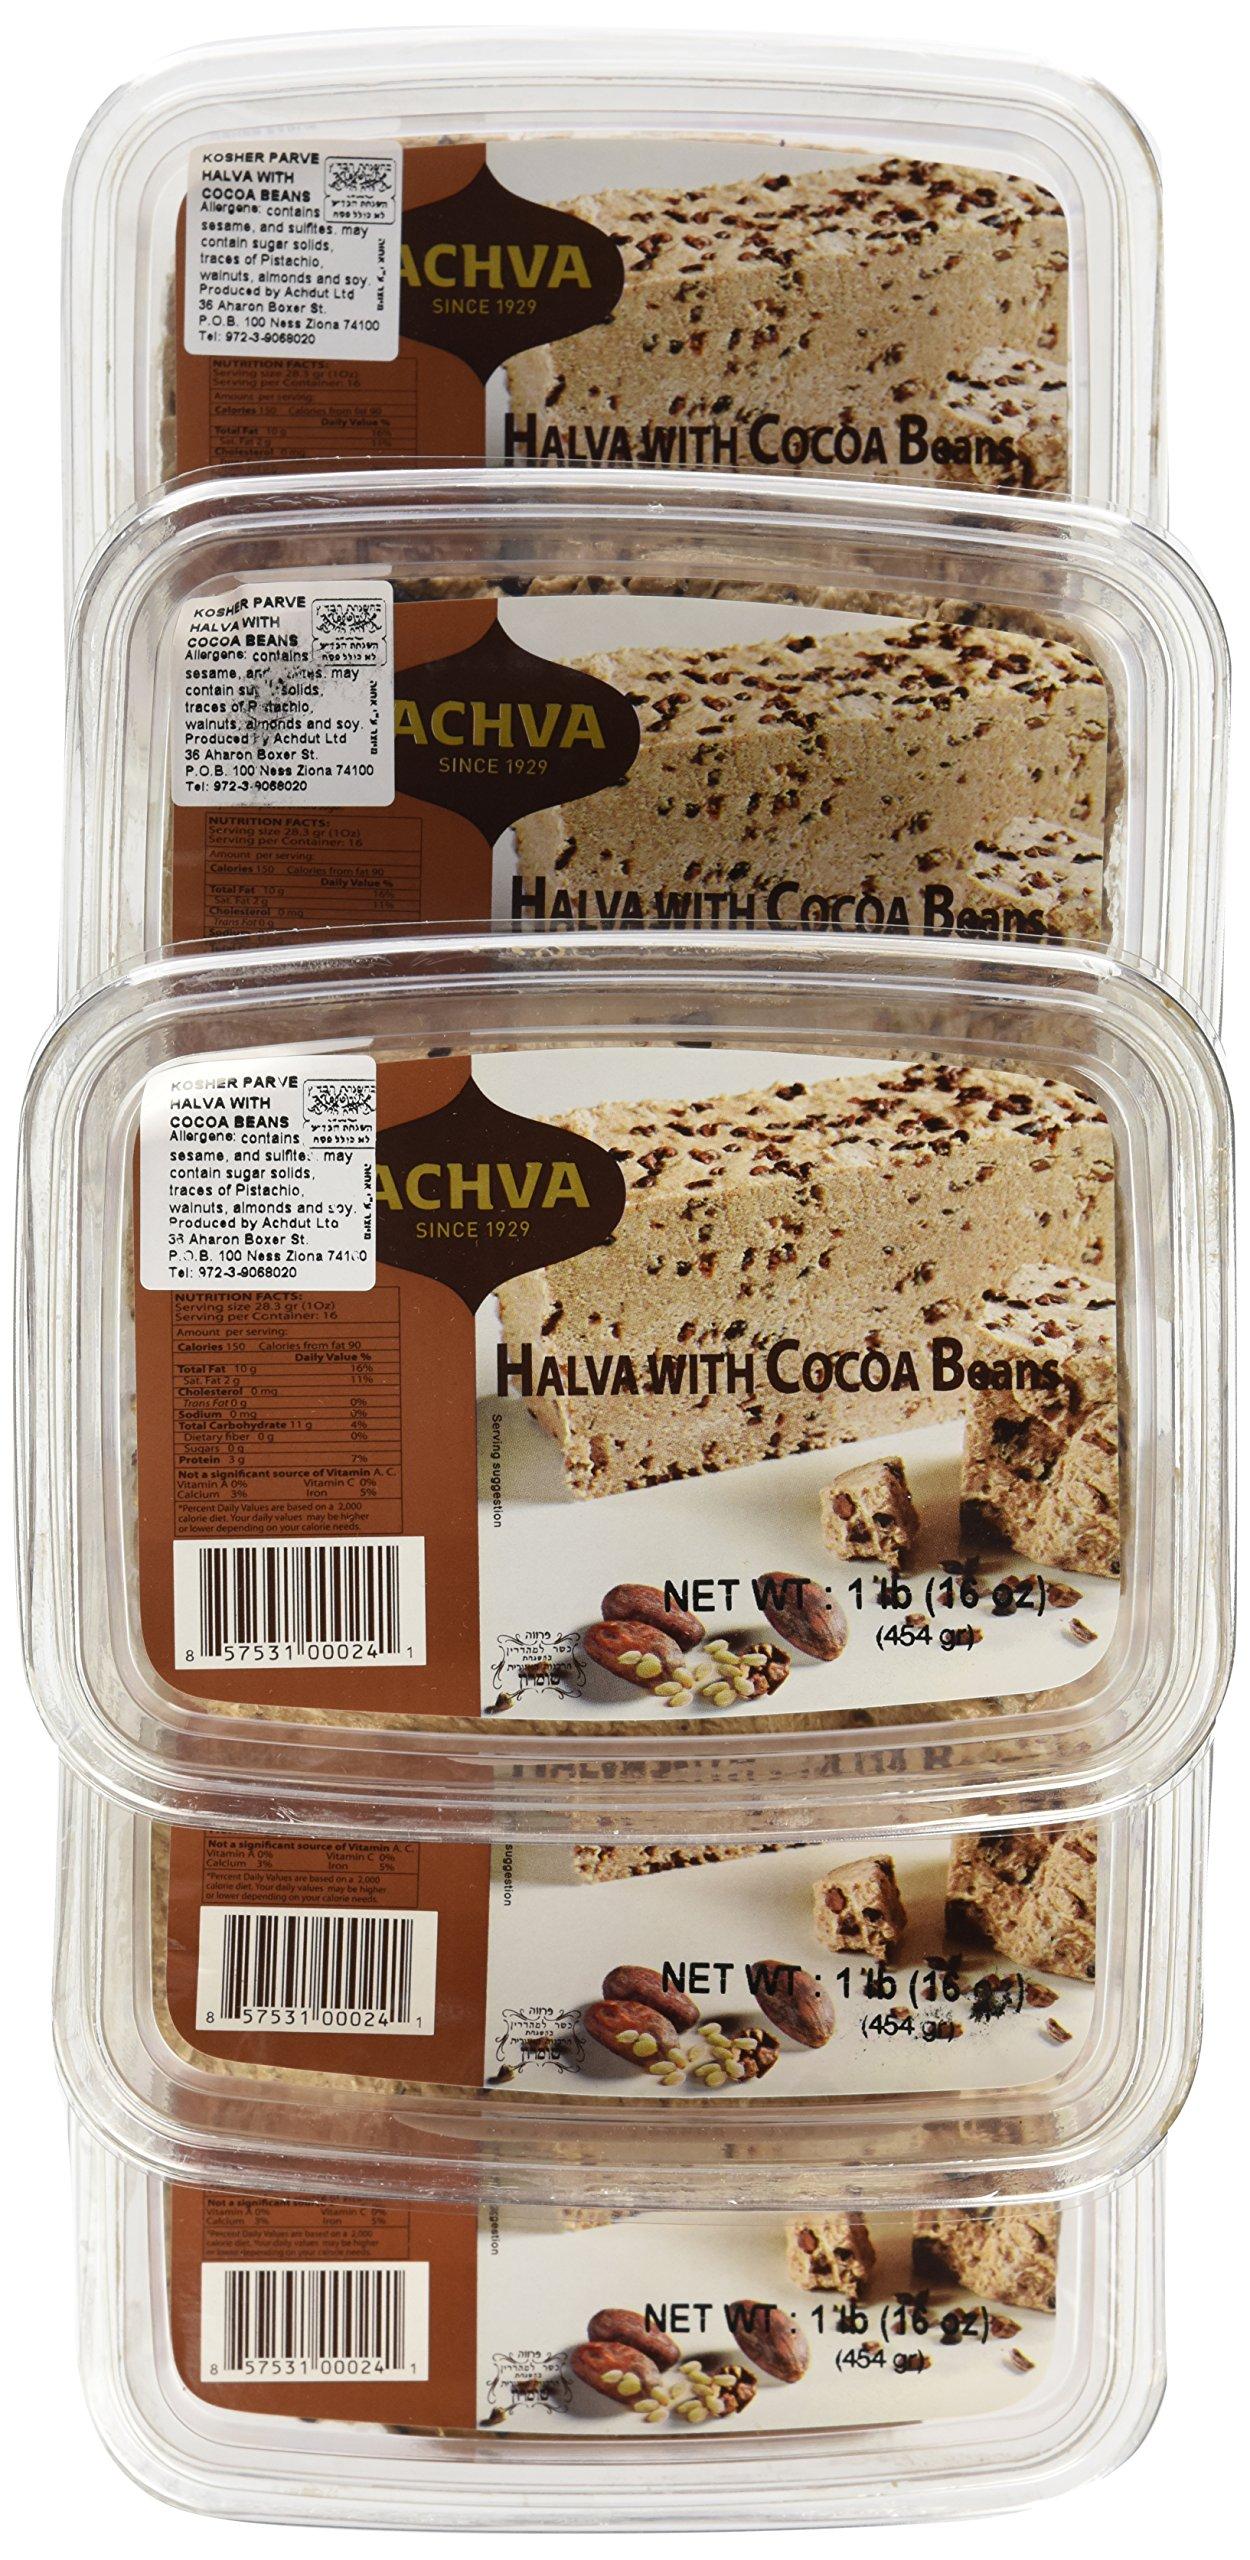 Achva Halva, Cocoa Beans, 16-Ounce Trays (Pack of 12)